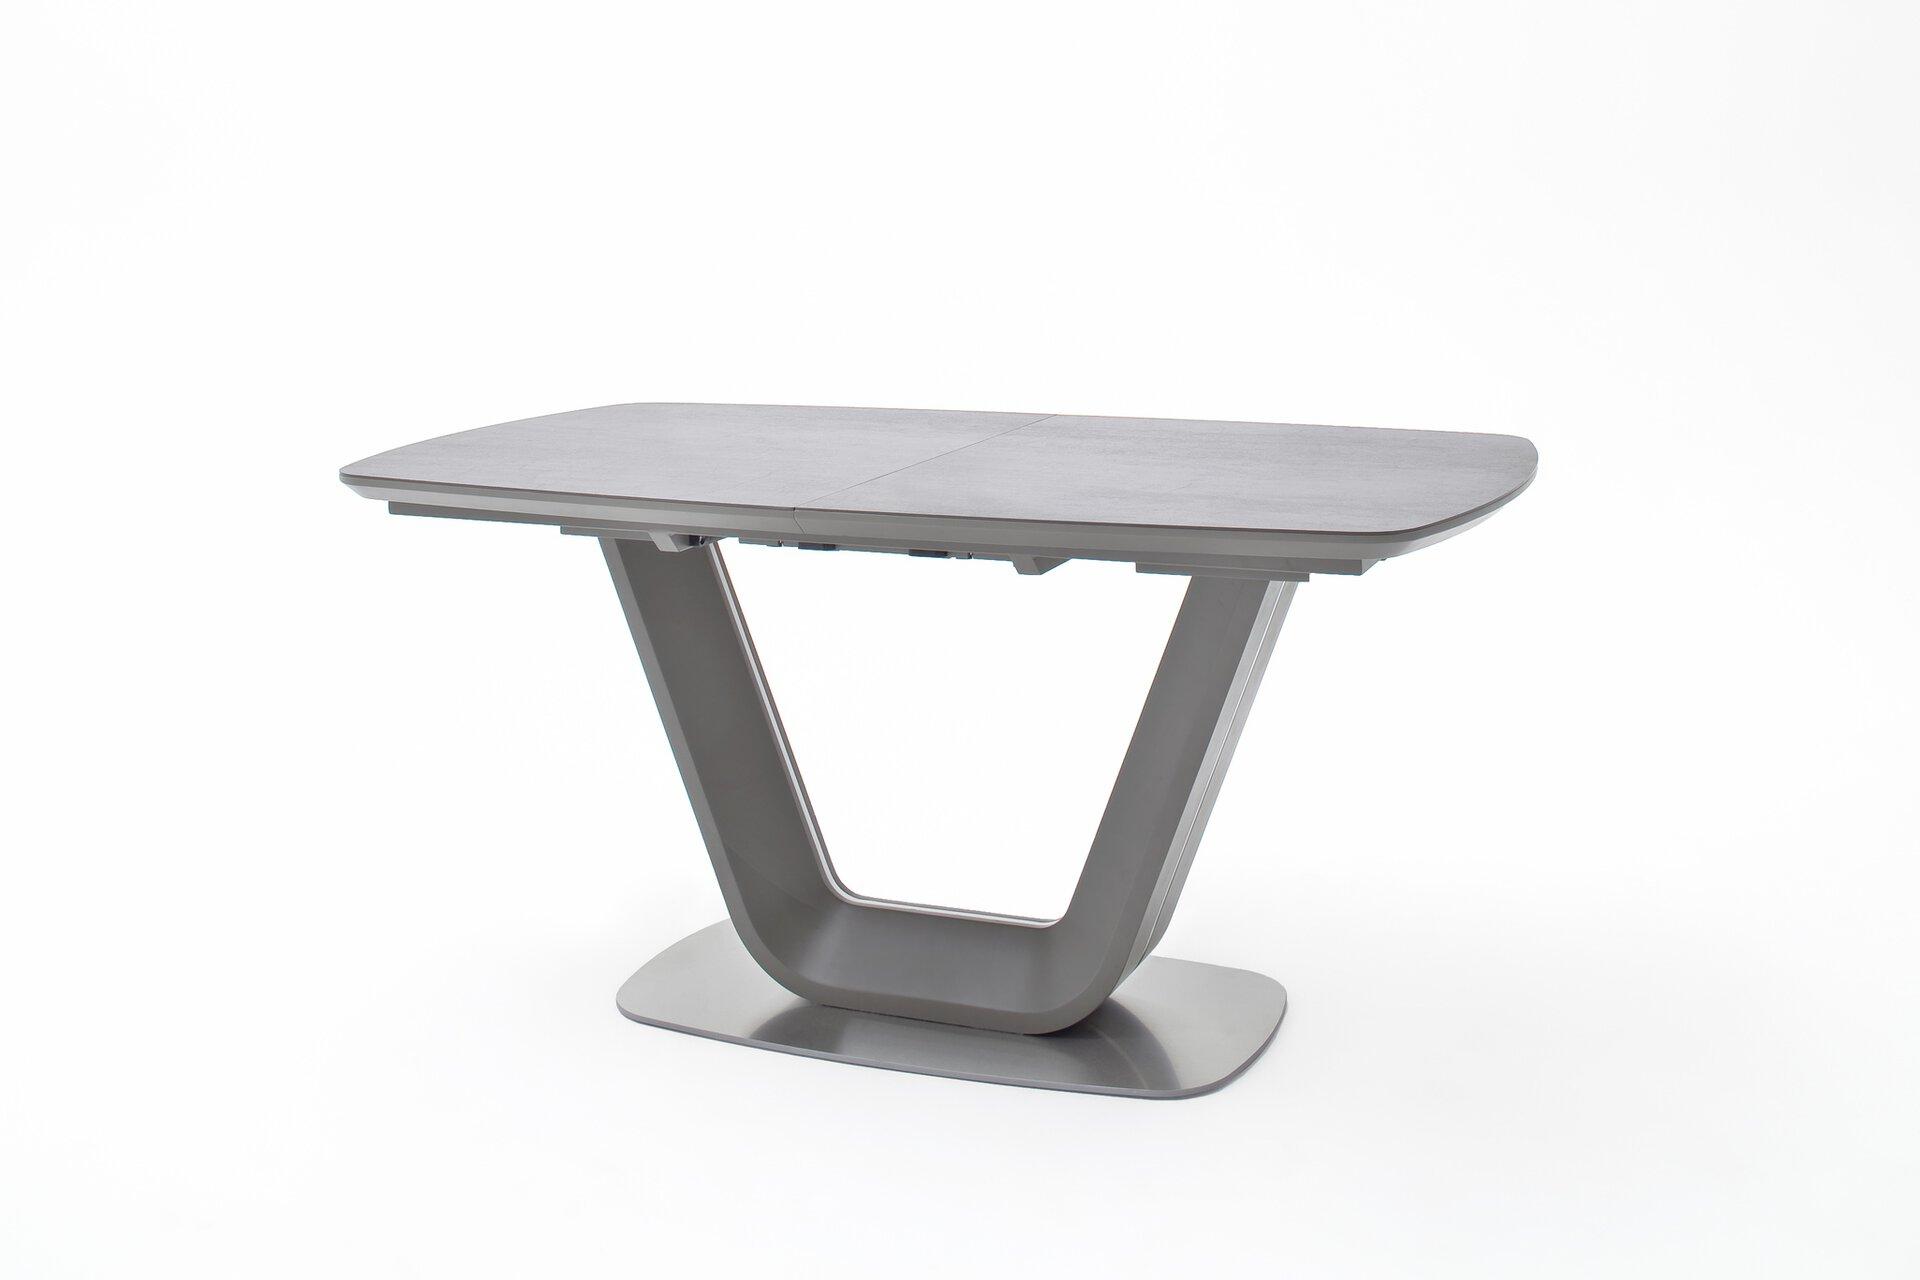 Esstisch JARUK MCA furniture Metall 90 x 76 x 160 cm